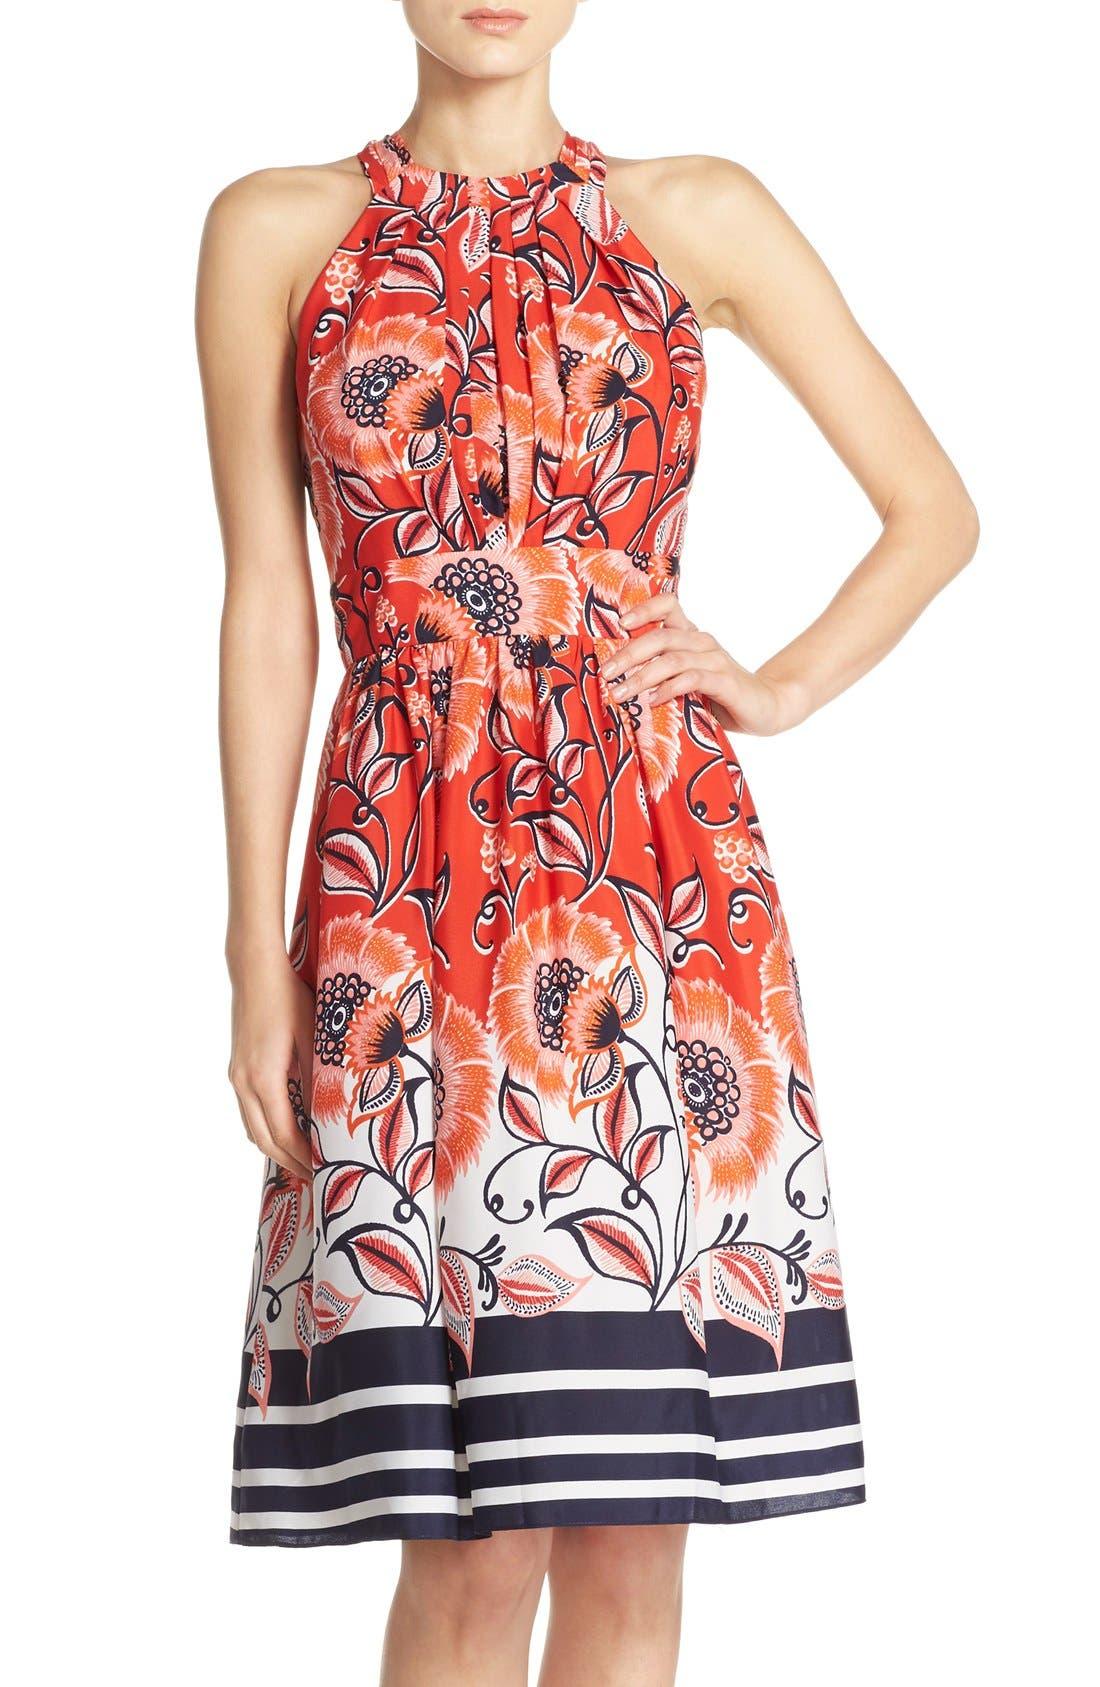 Alternate Image 1 Selected - Eliza J Mixed Print Crêpe de Chine Fit & Flare Dress